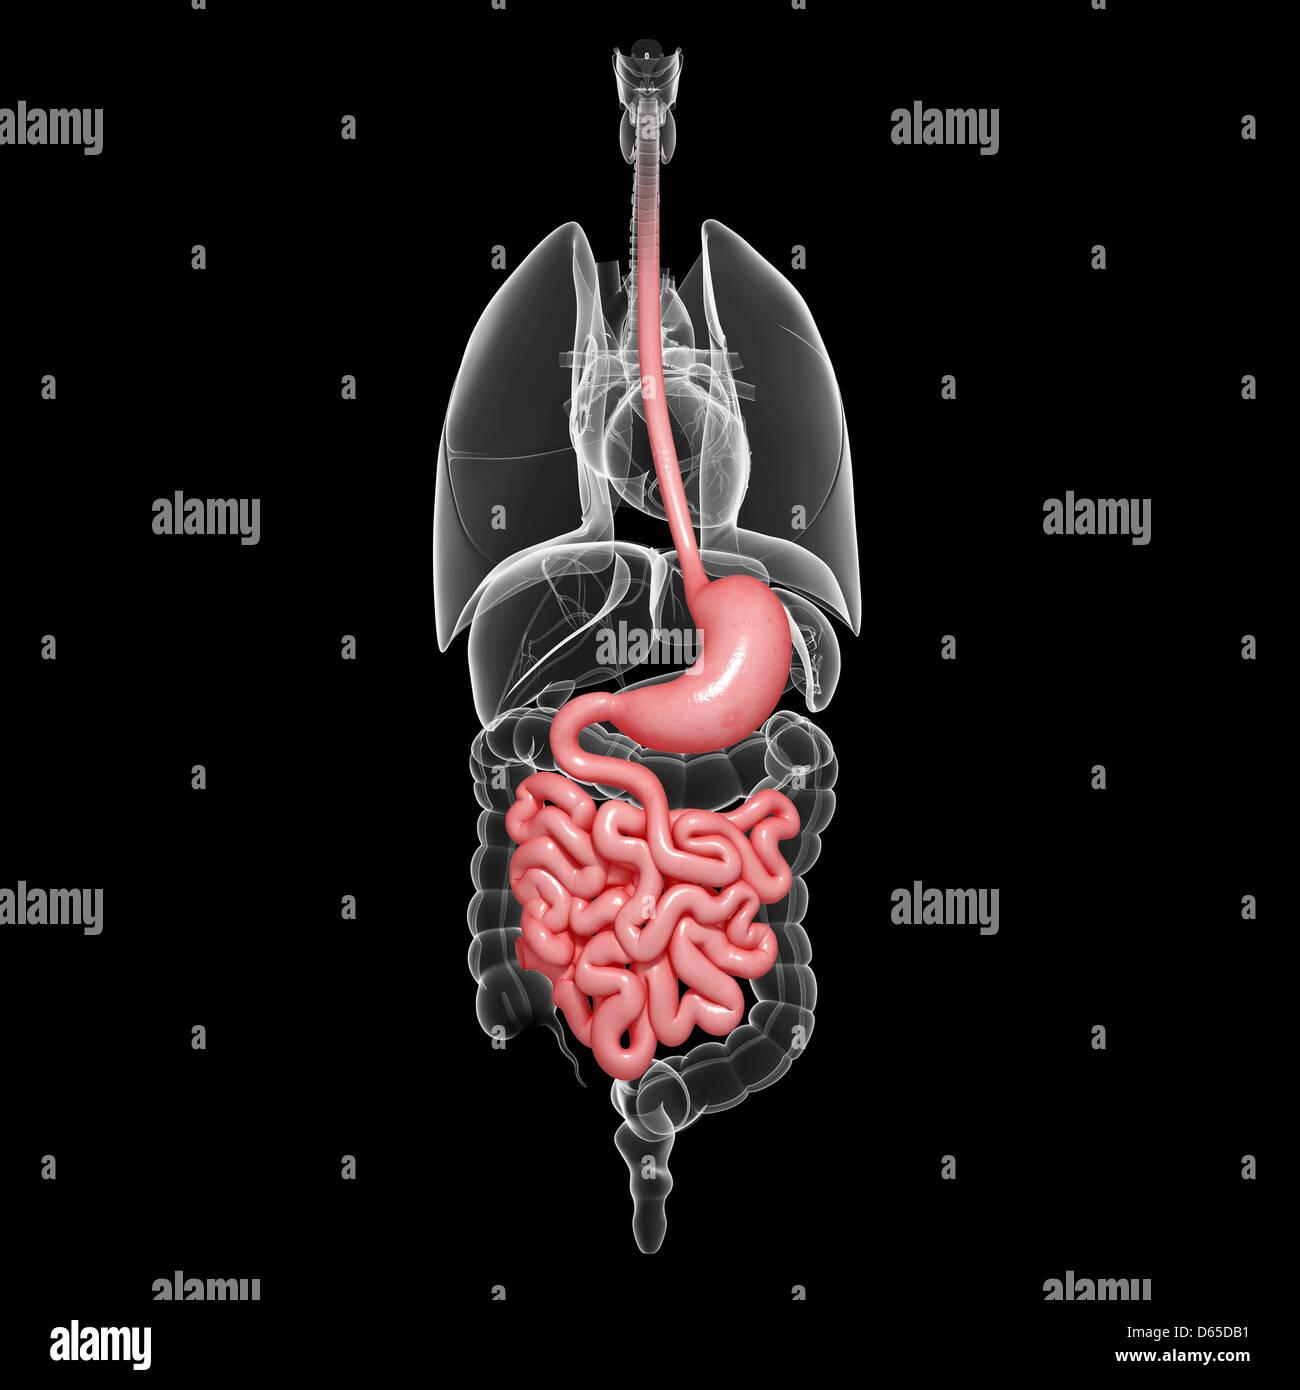 Human Digestive System Organs Stock Photos Human Digestive System